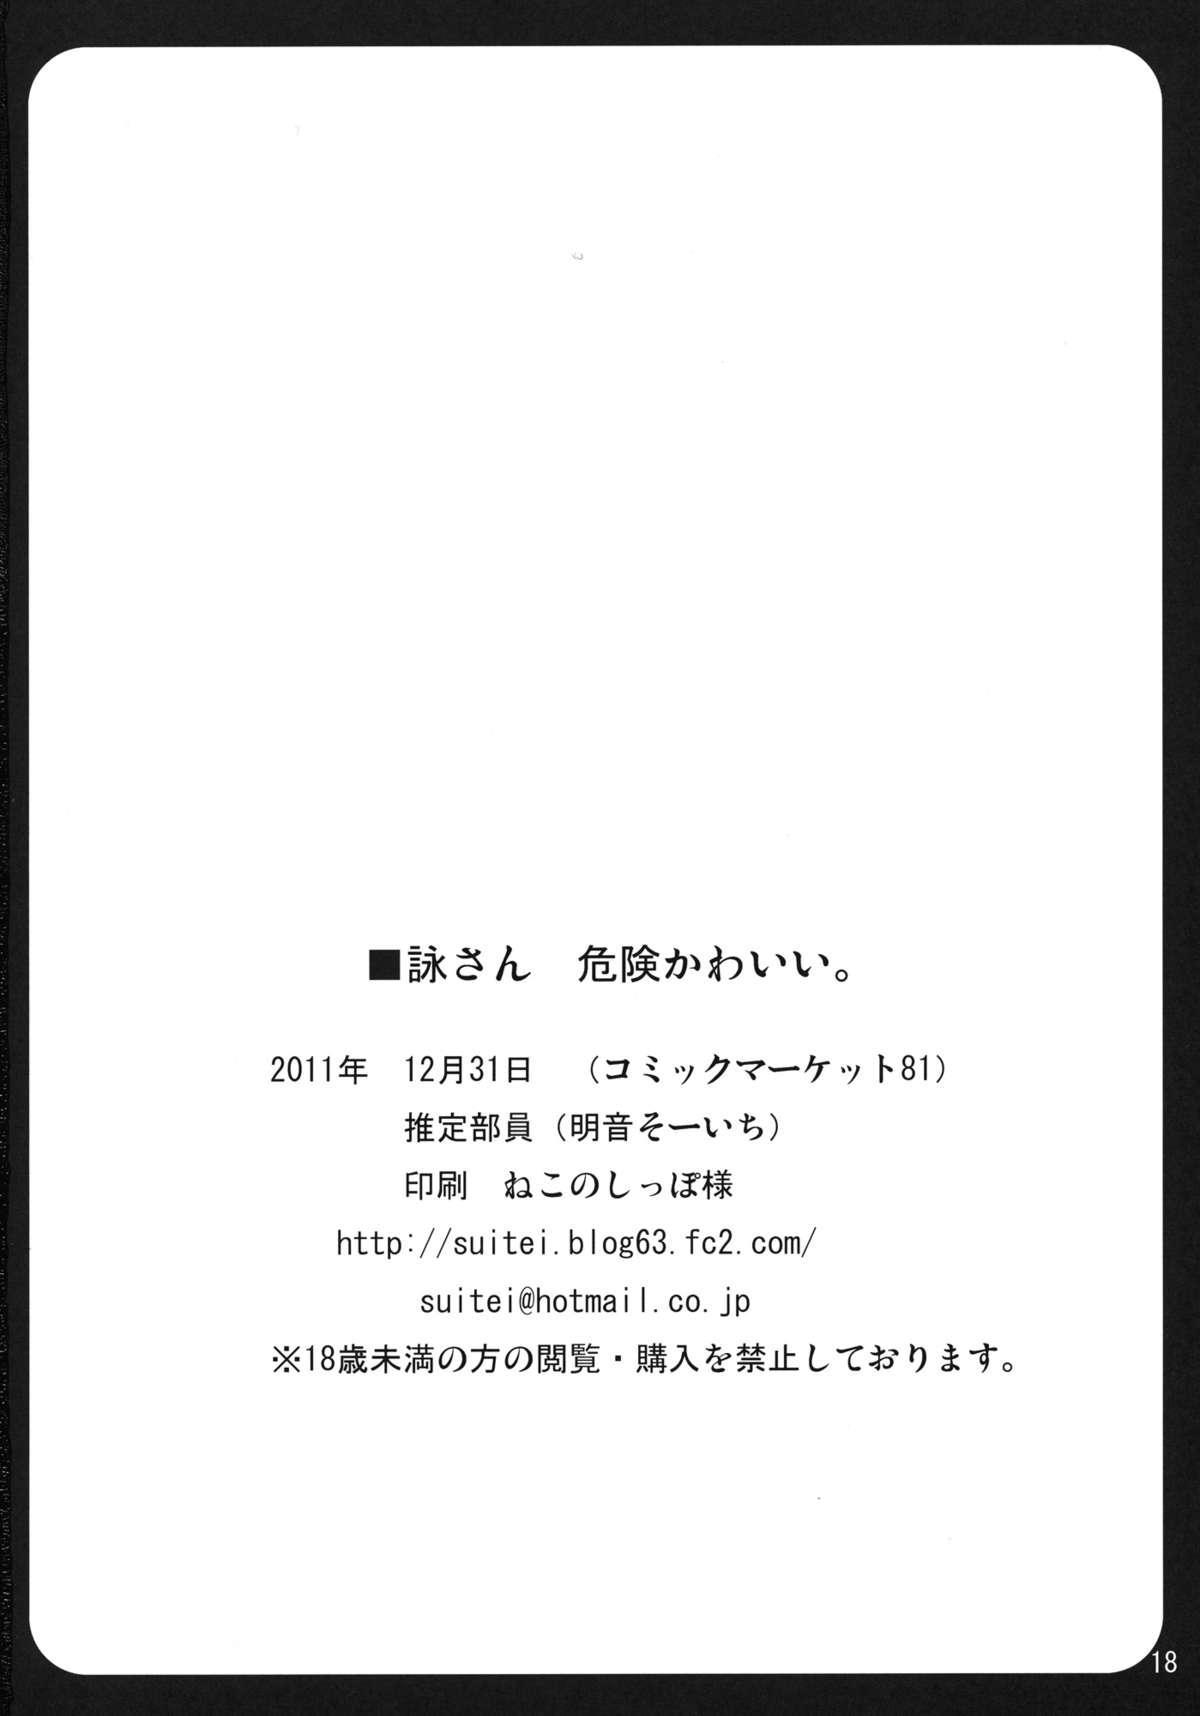 Yomi-san Kiken Kawaii. 16